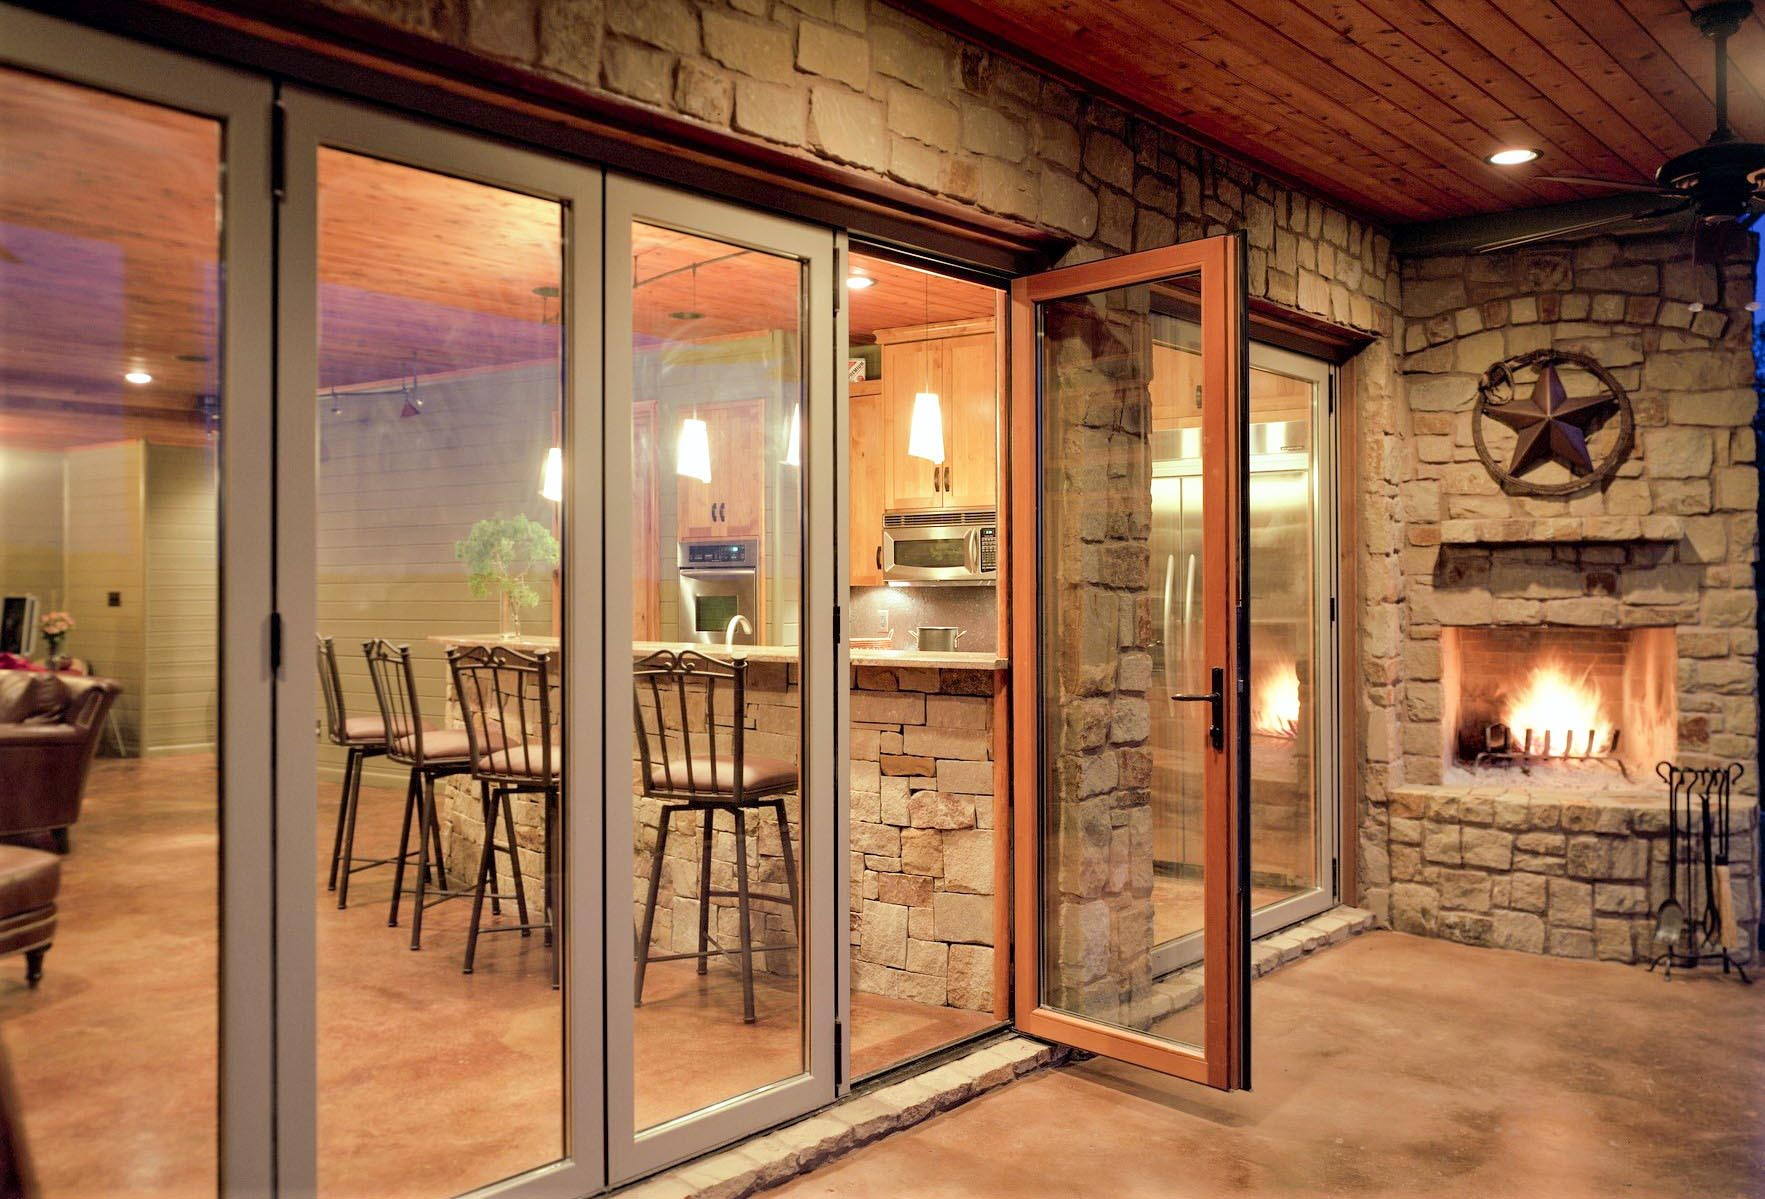 aluminum clad over solid wood framed folding patio door